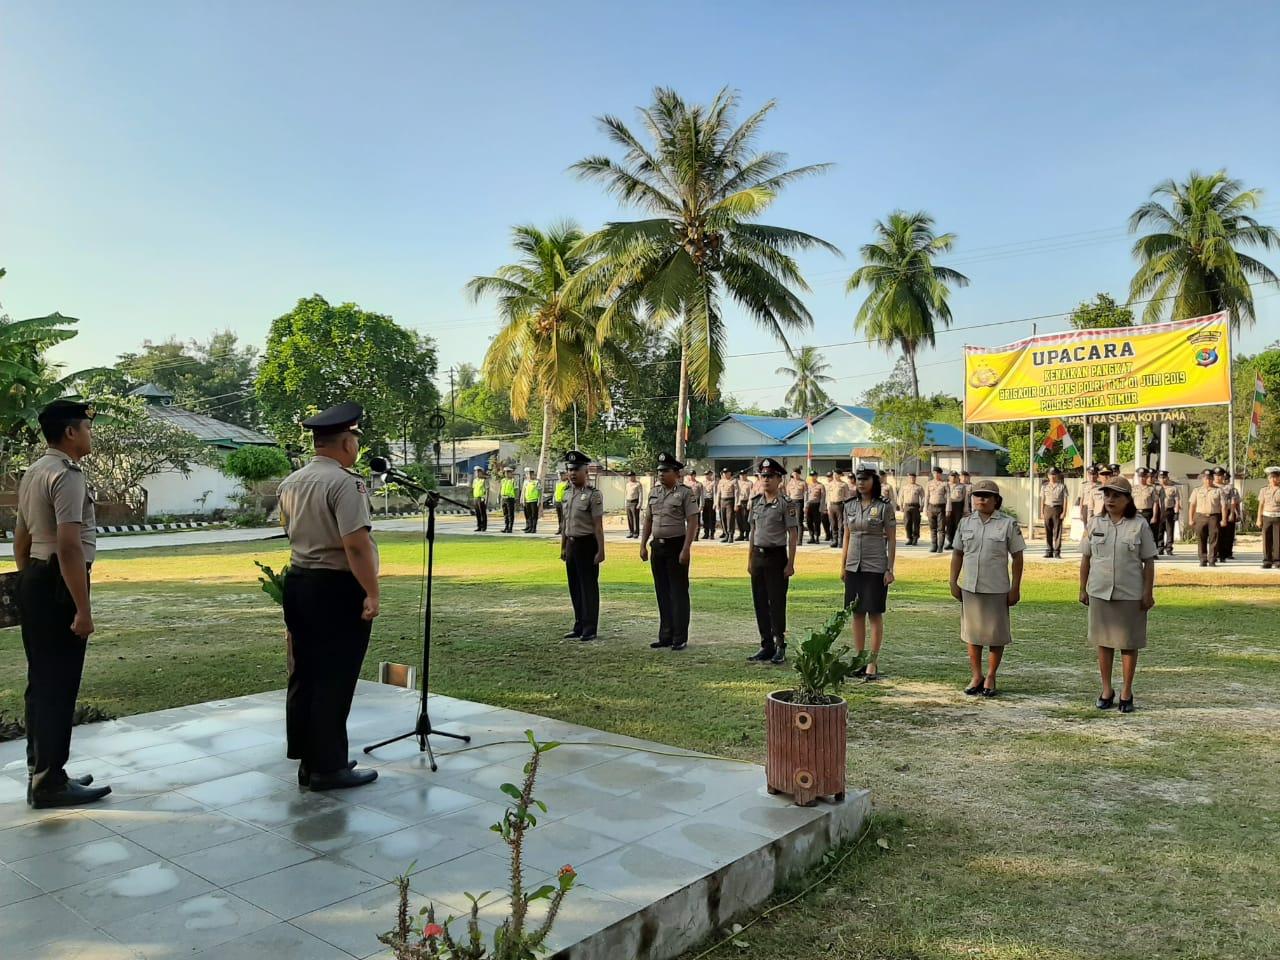 Puluhan Personel Polres Sumba Timur Dapat Kado Spesial di Hari Bhayangkara Ke 73